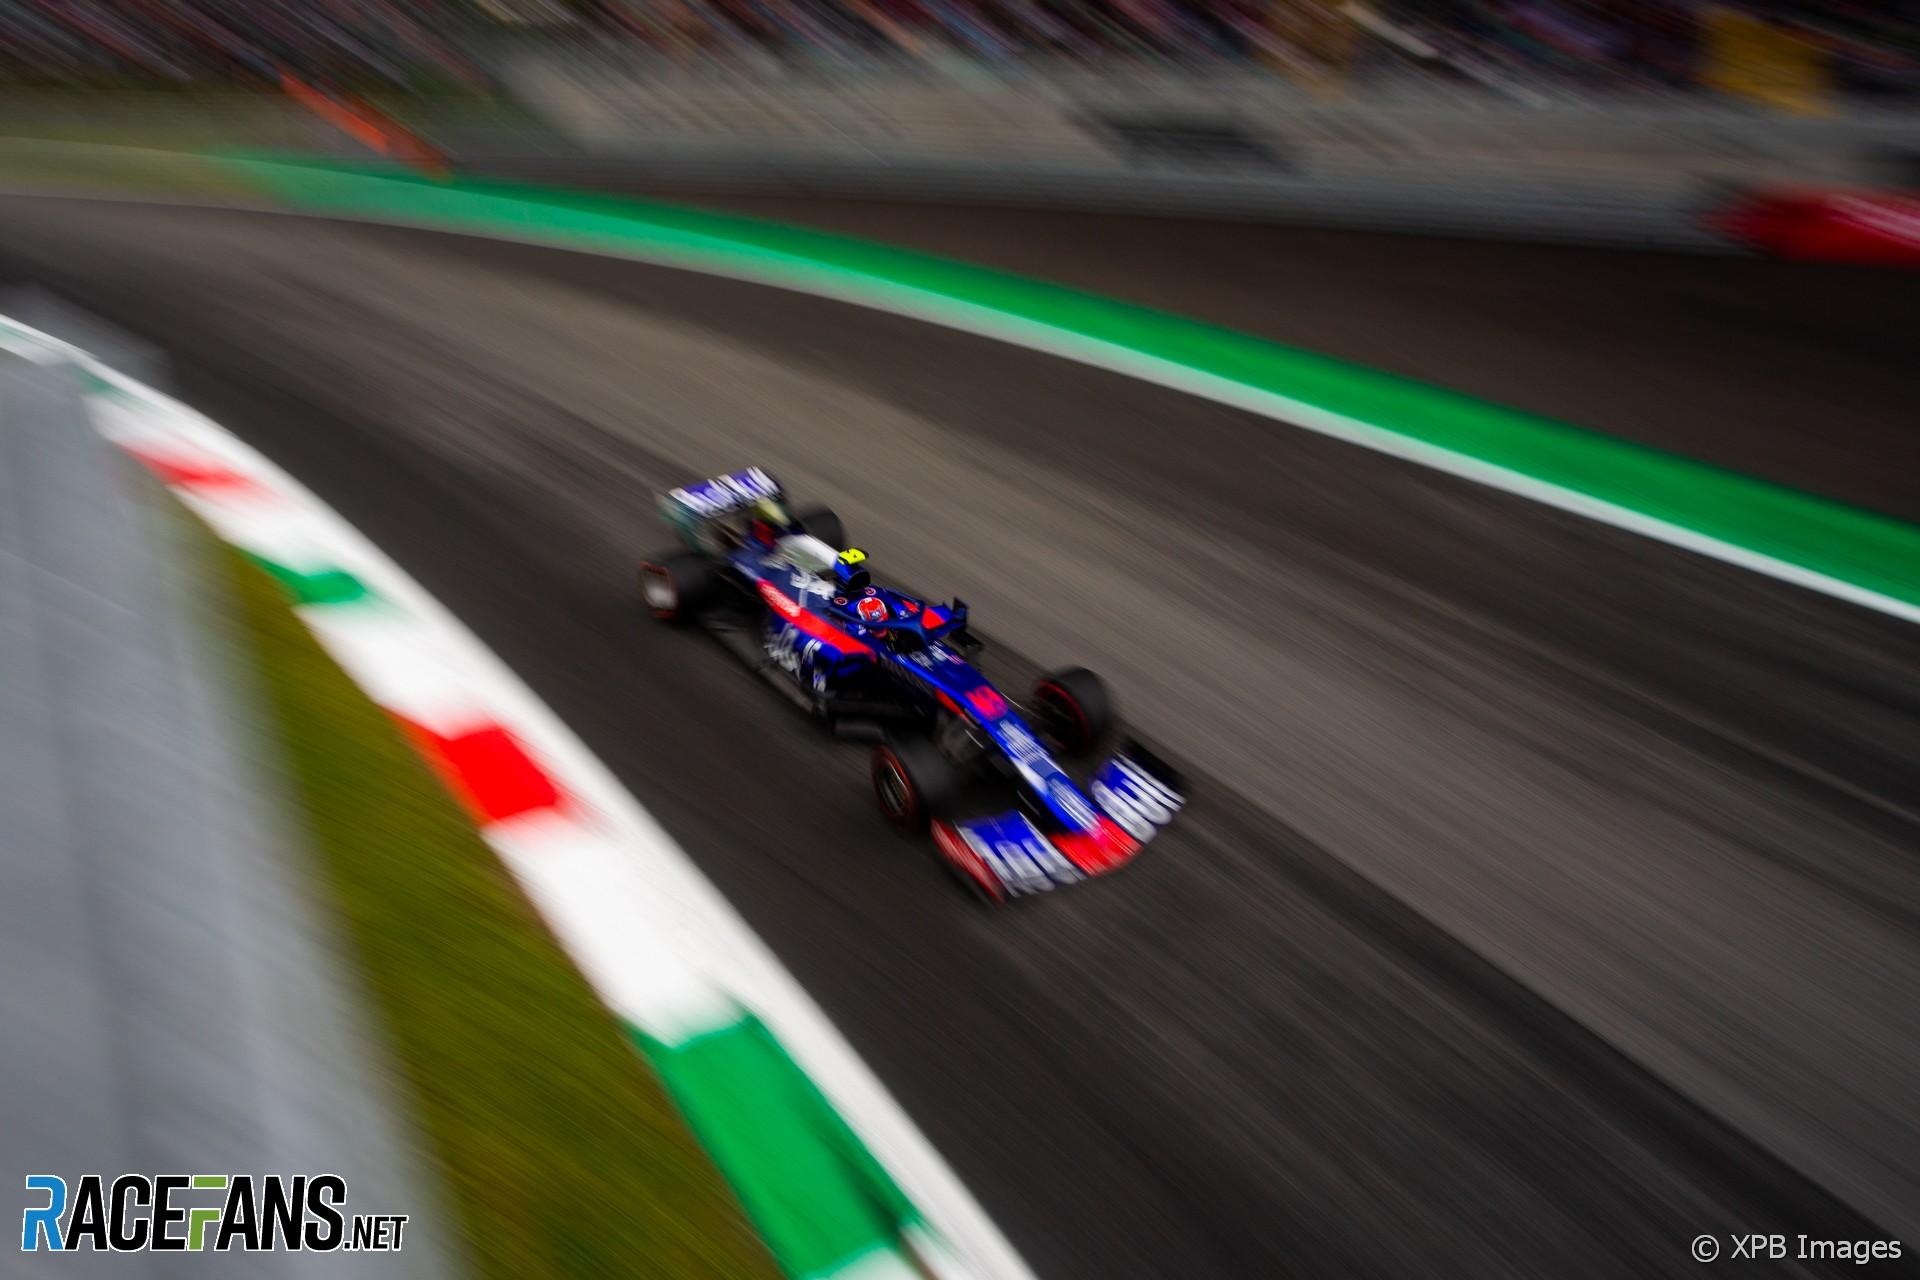 Pierre Gasly, Toro Rosso, Monza, 2019